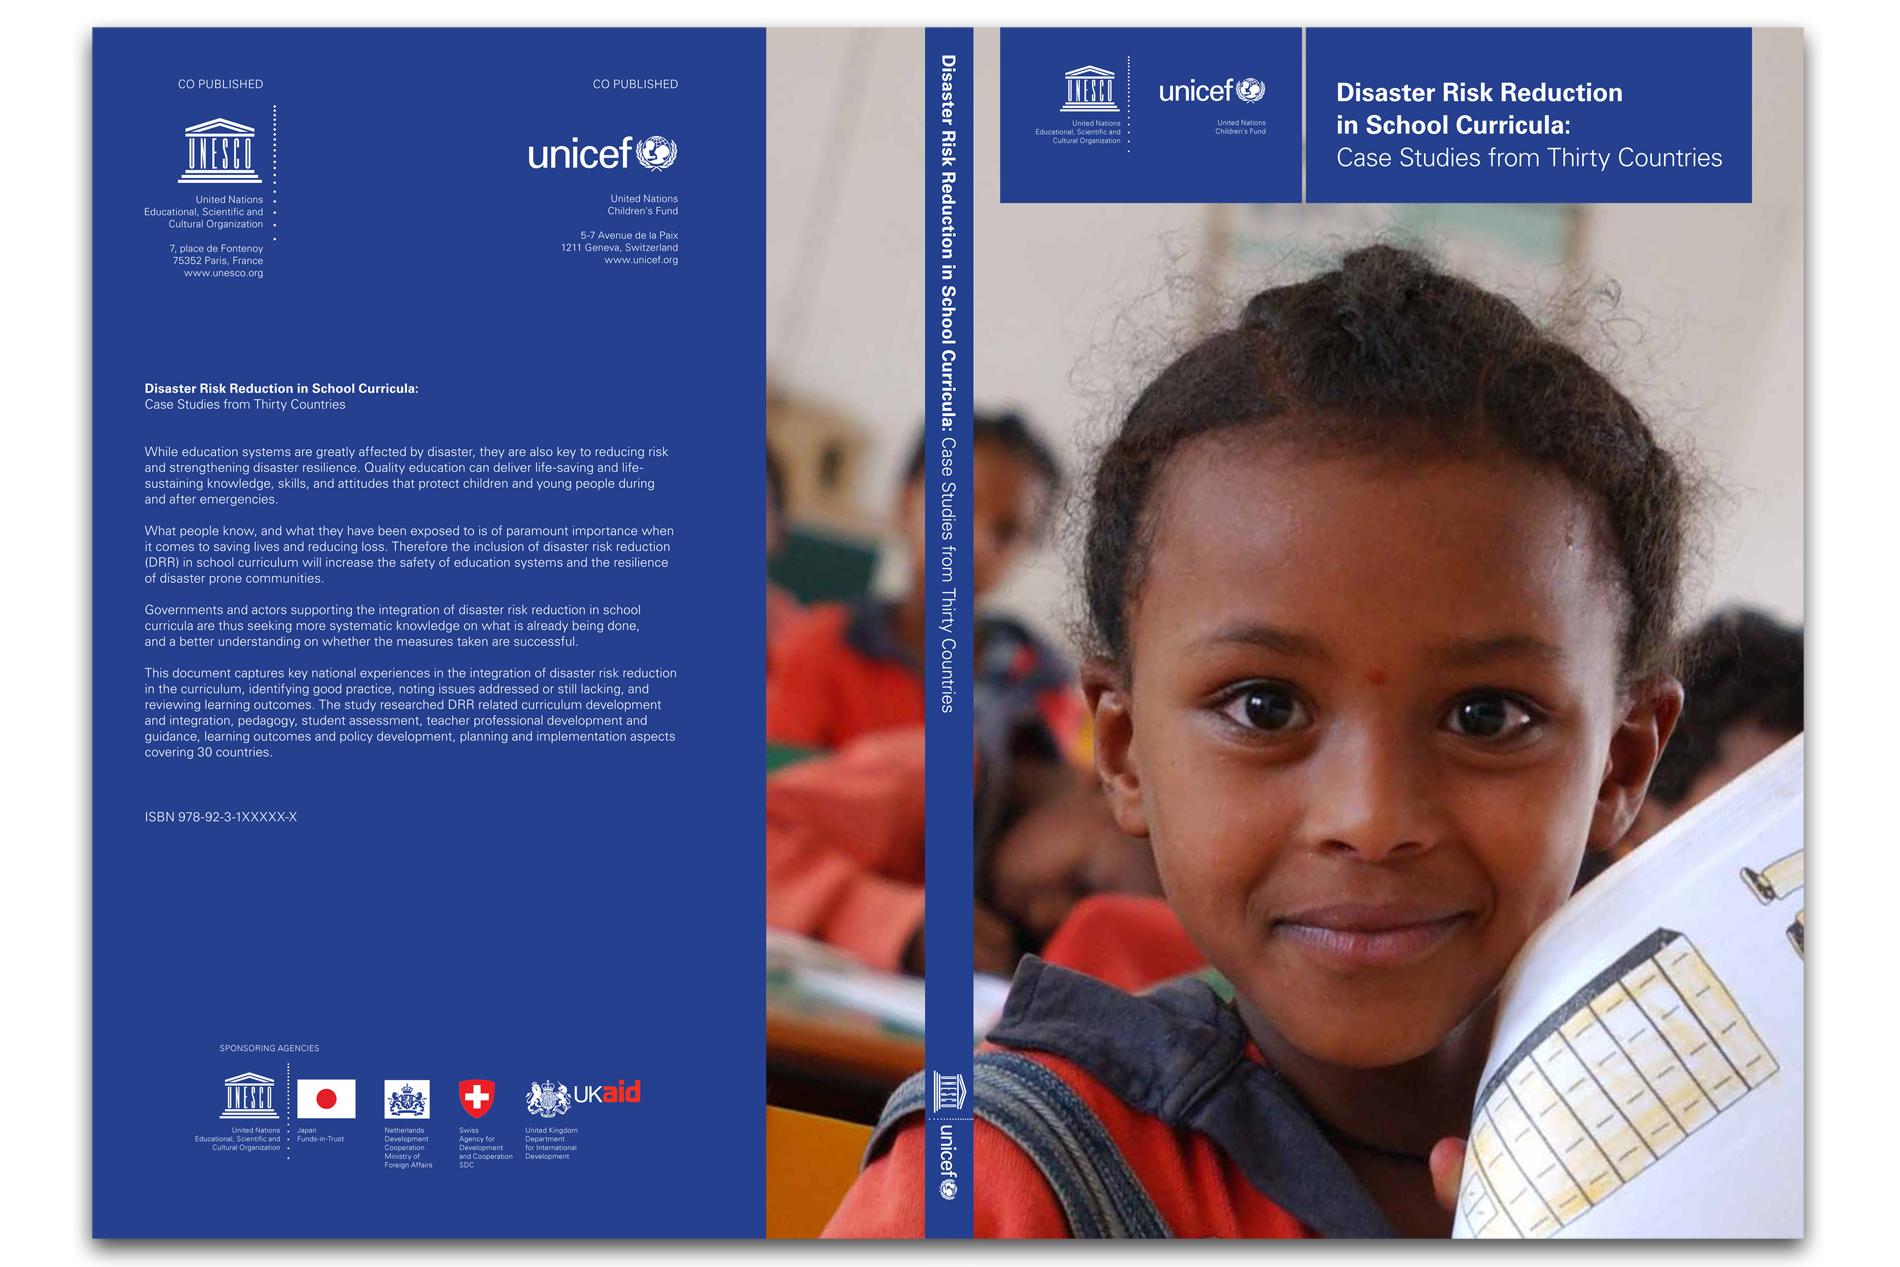 UNICEF/UNESCO Report (Publications)